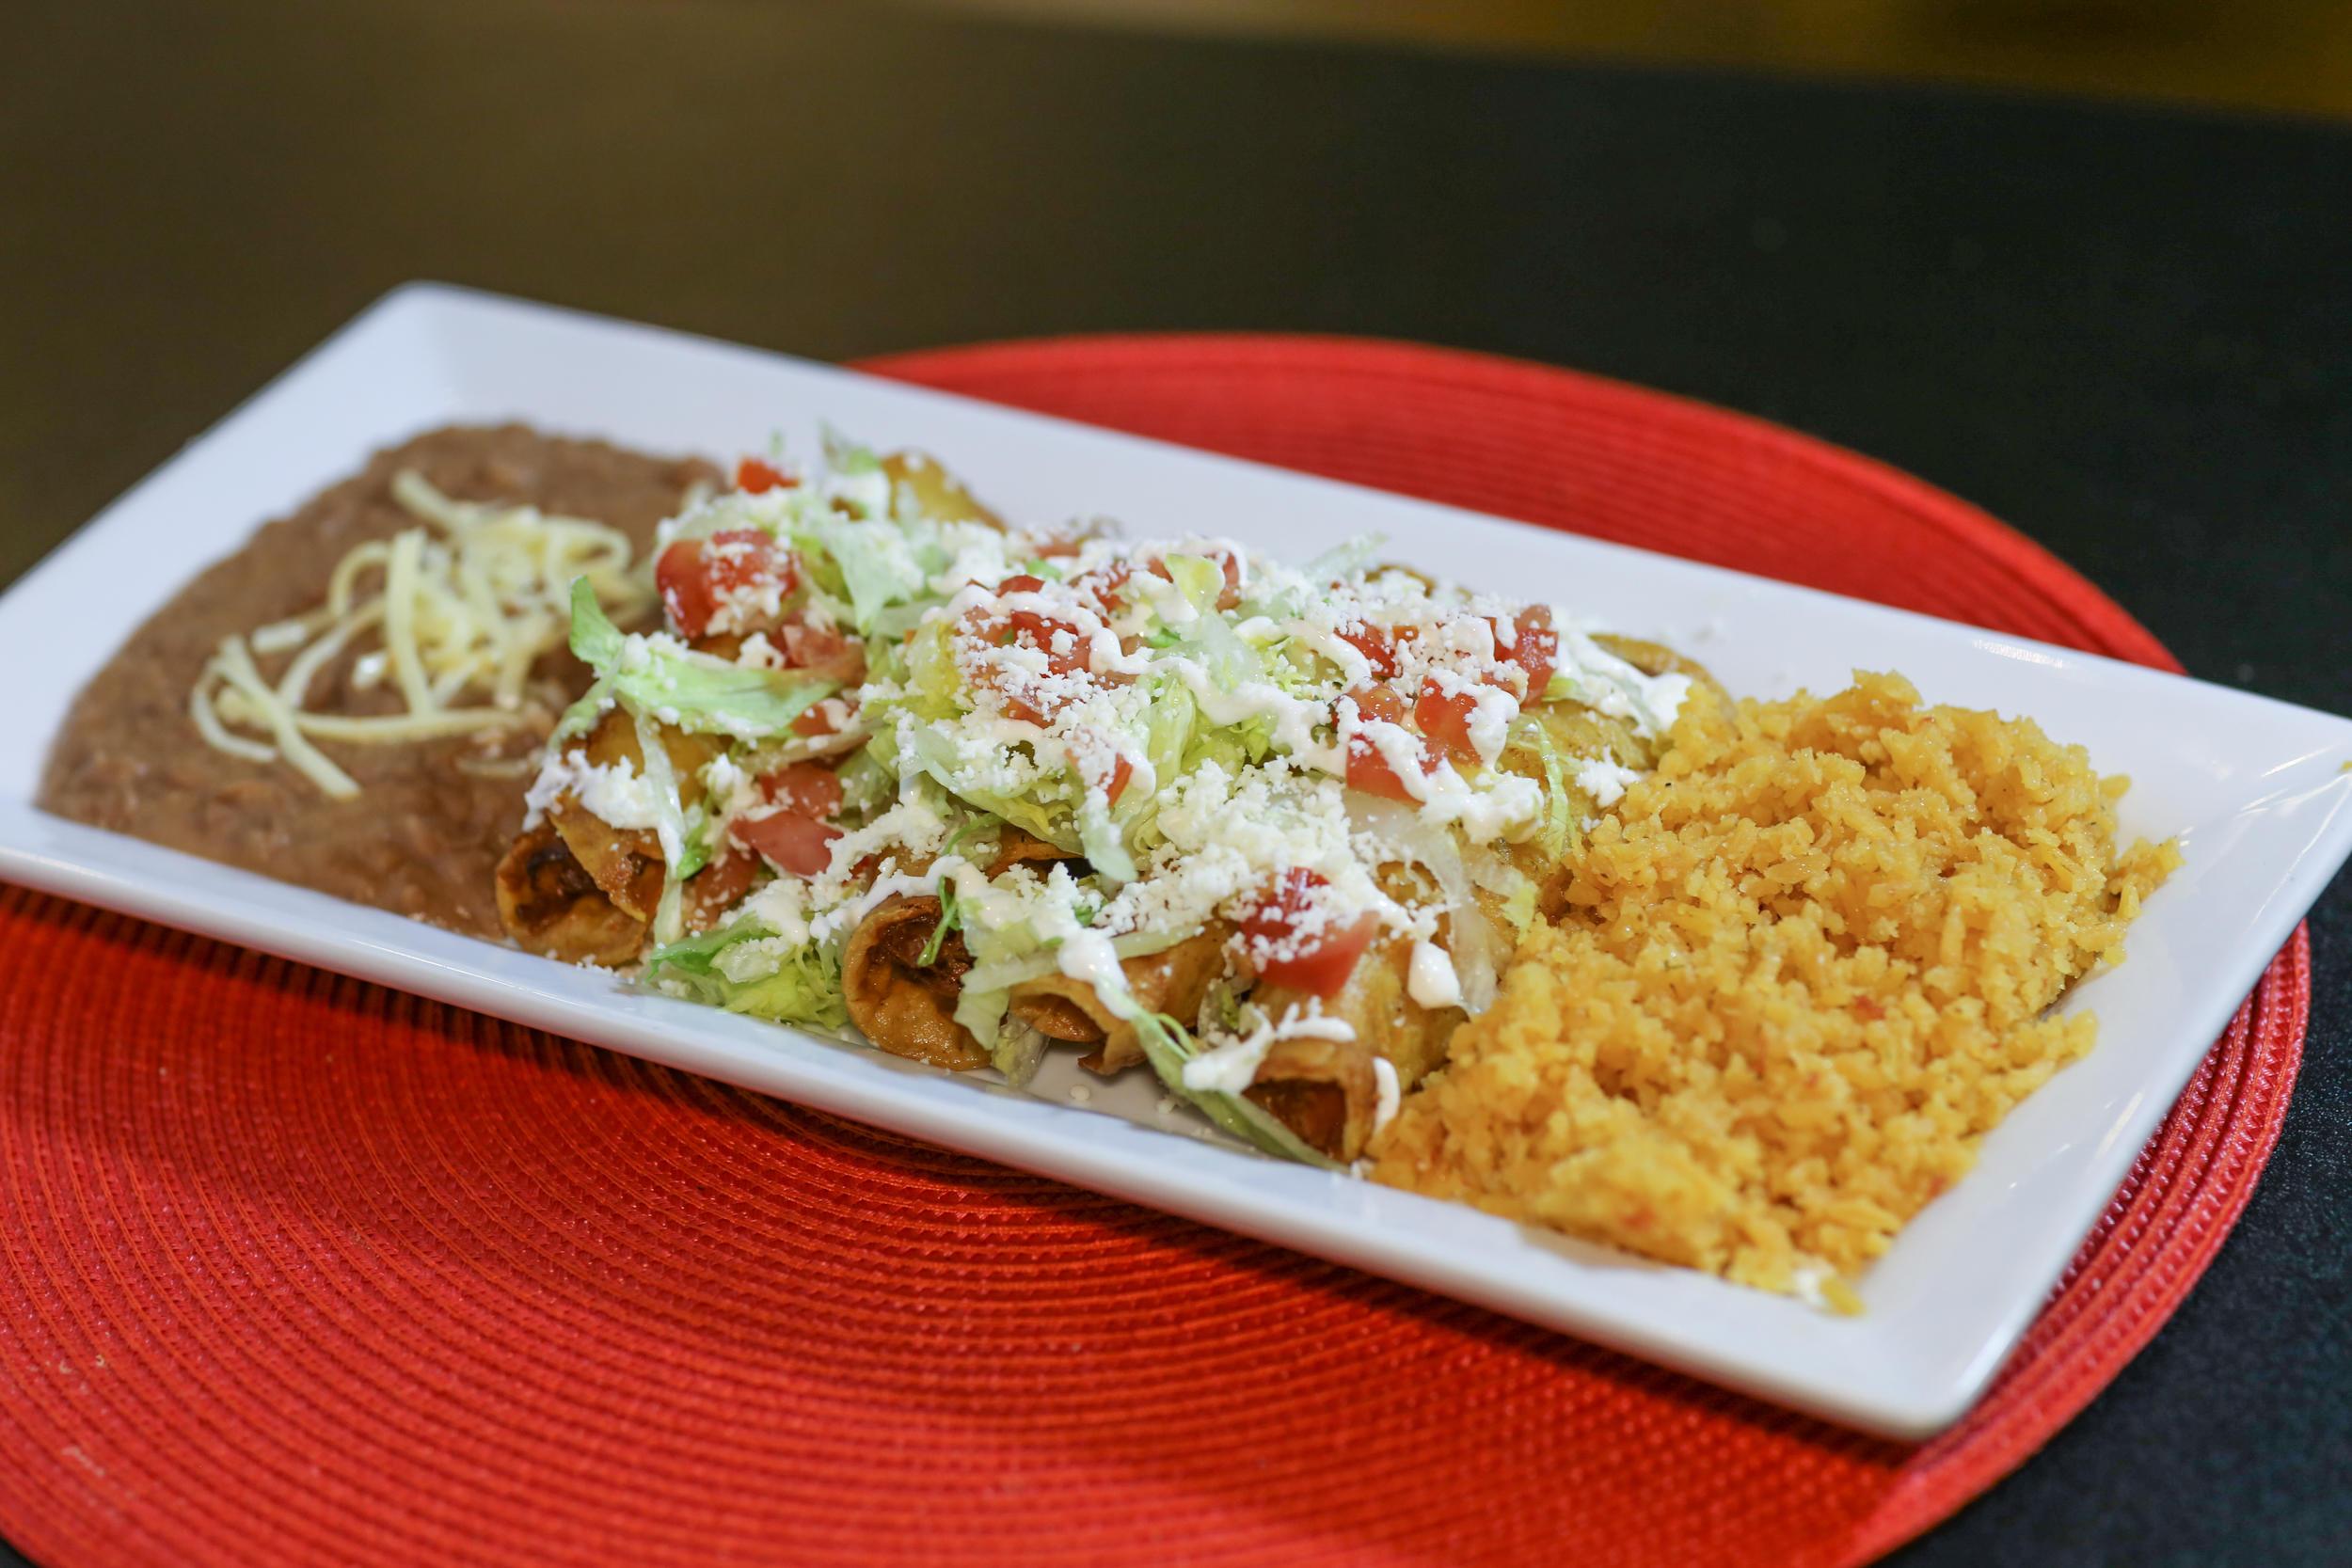 Habanero Mexican Restaurant image 1